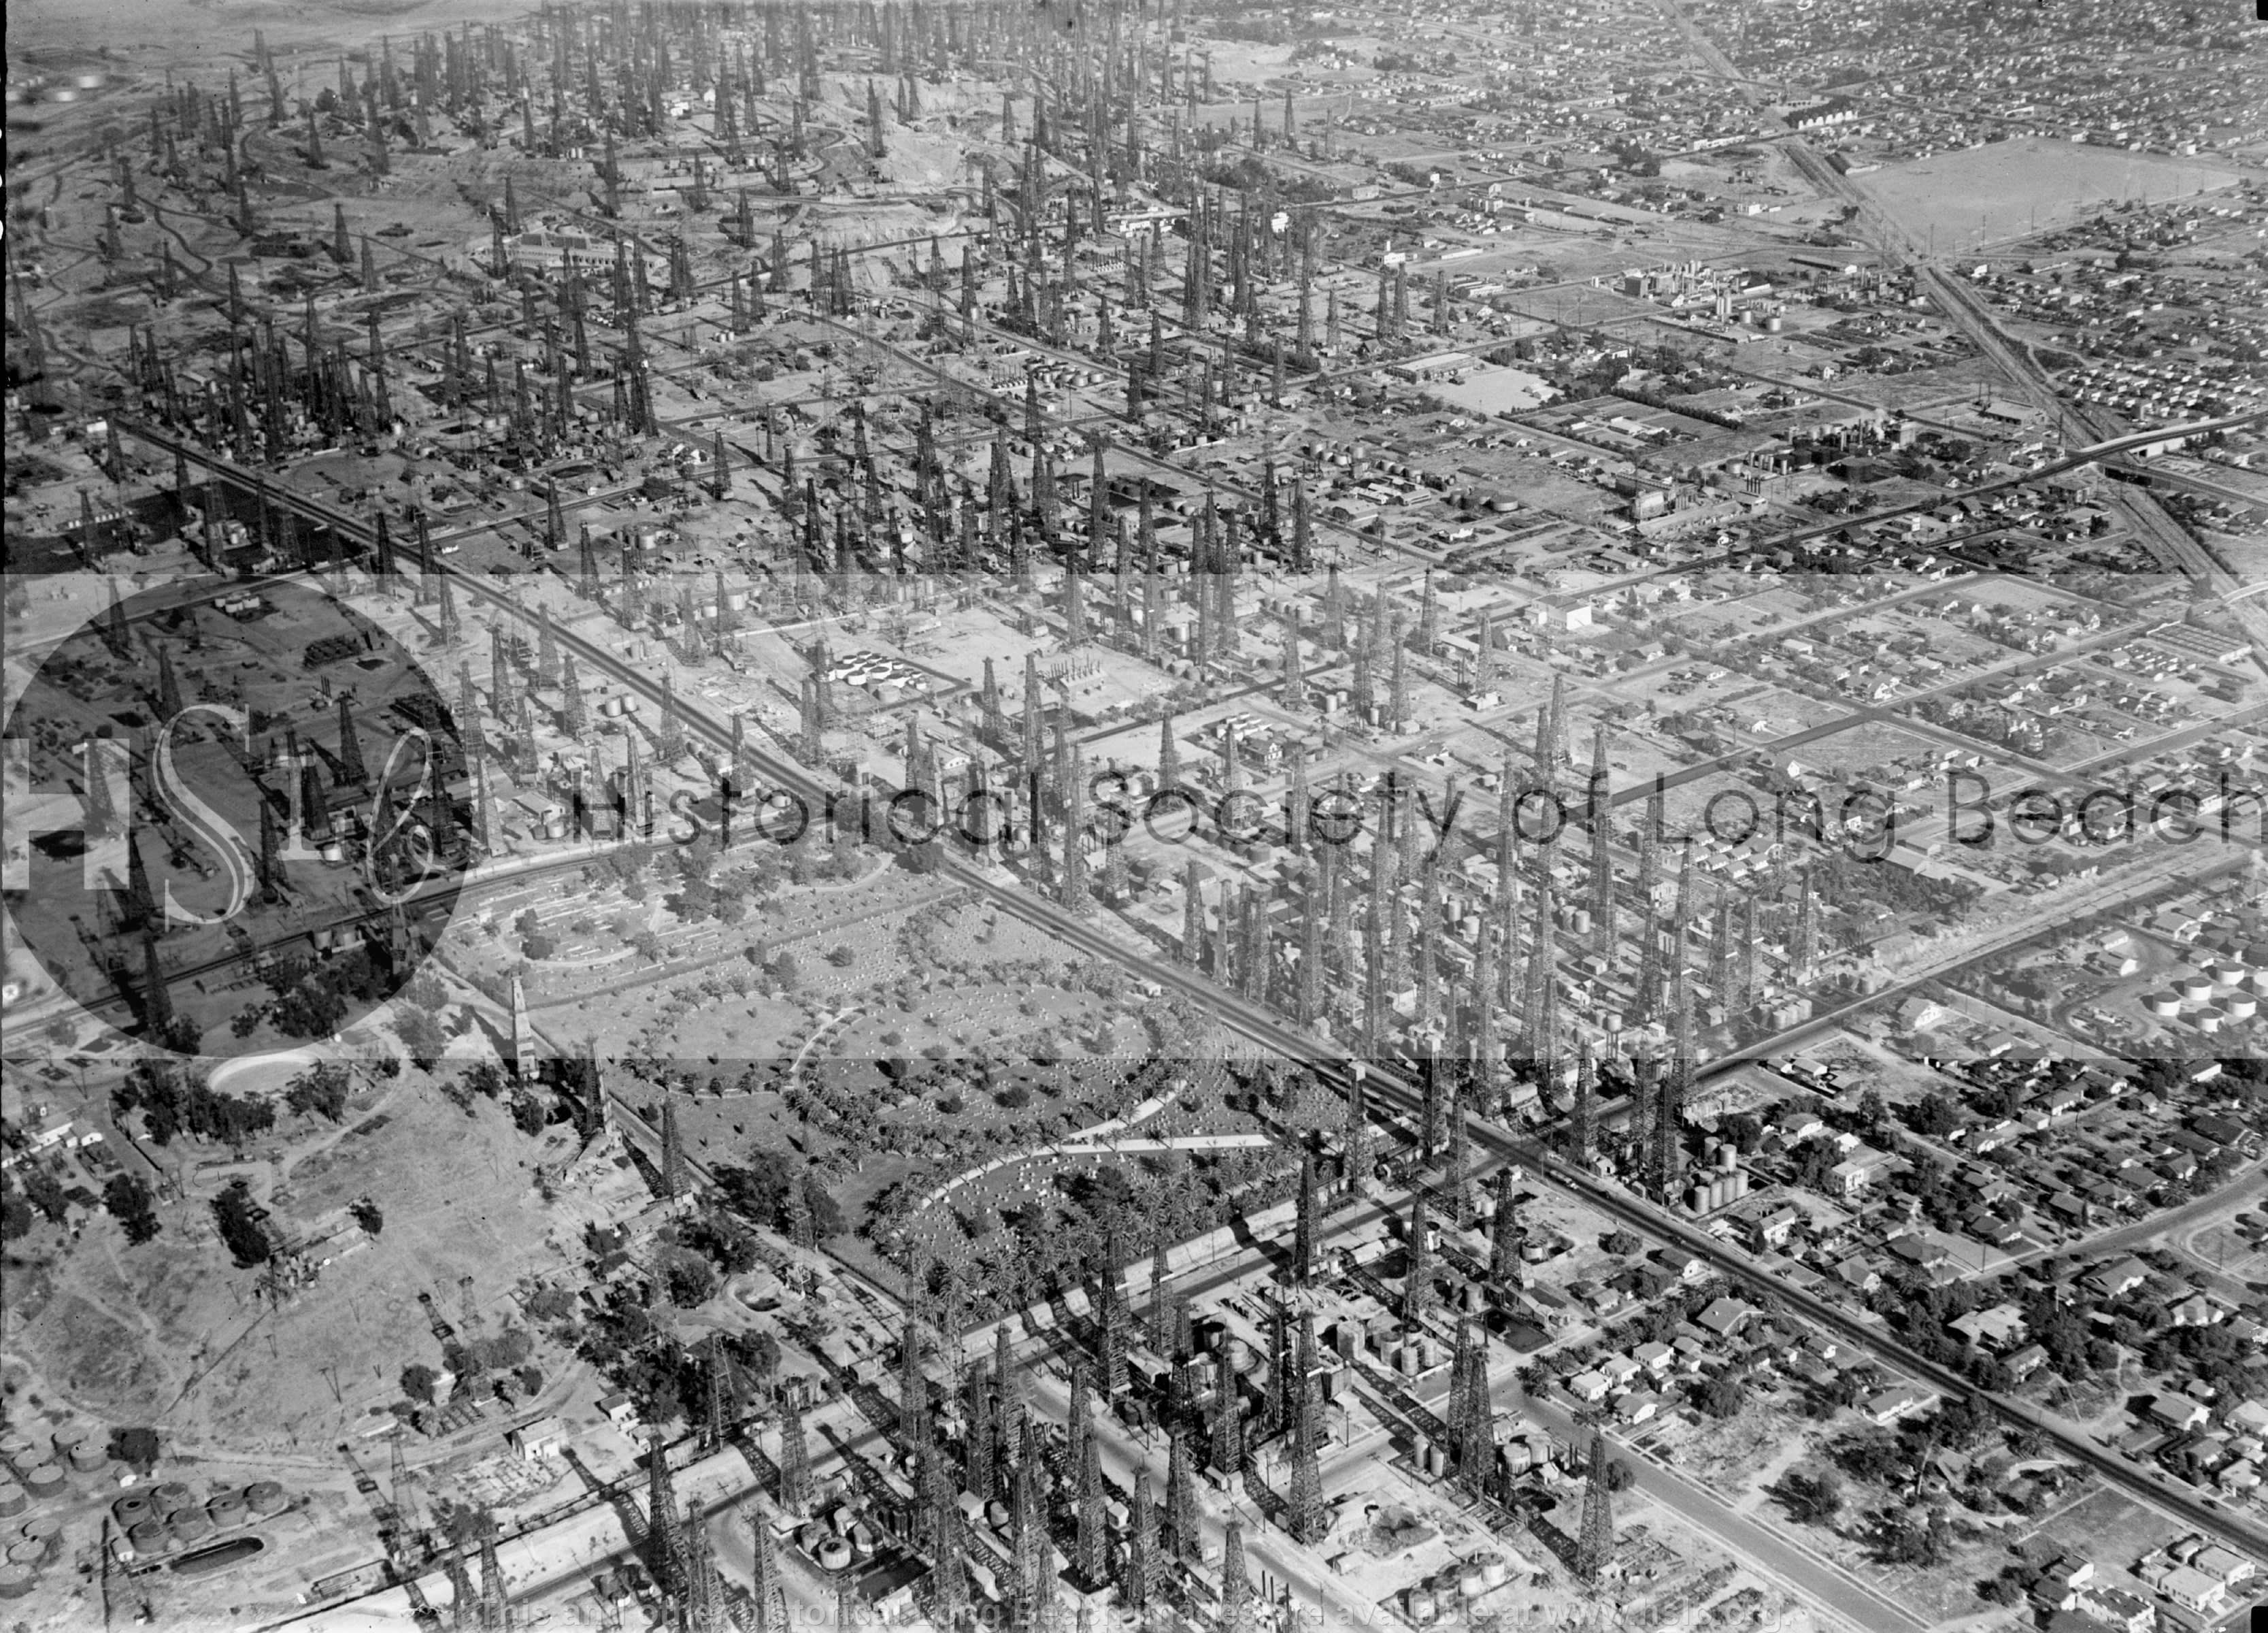 Long Beach cemeteries, 1936 historical photograph